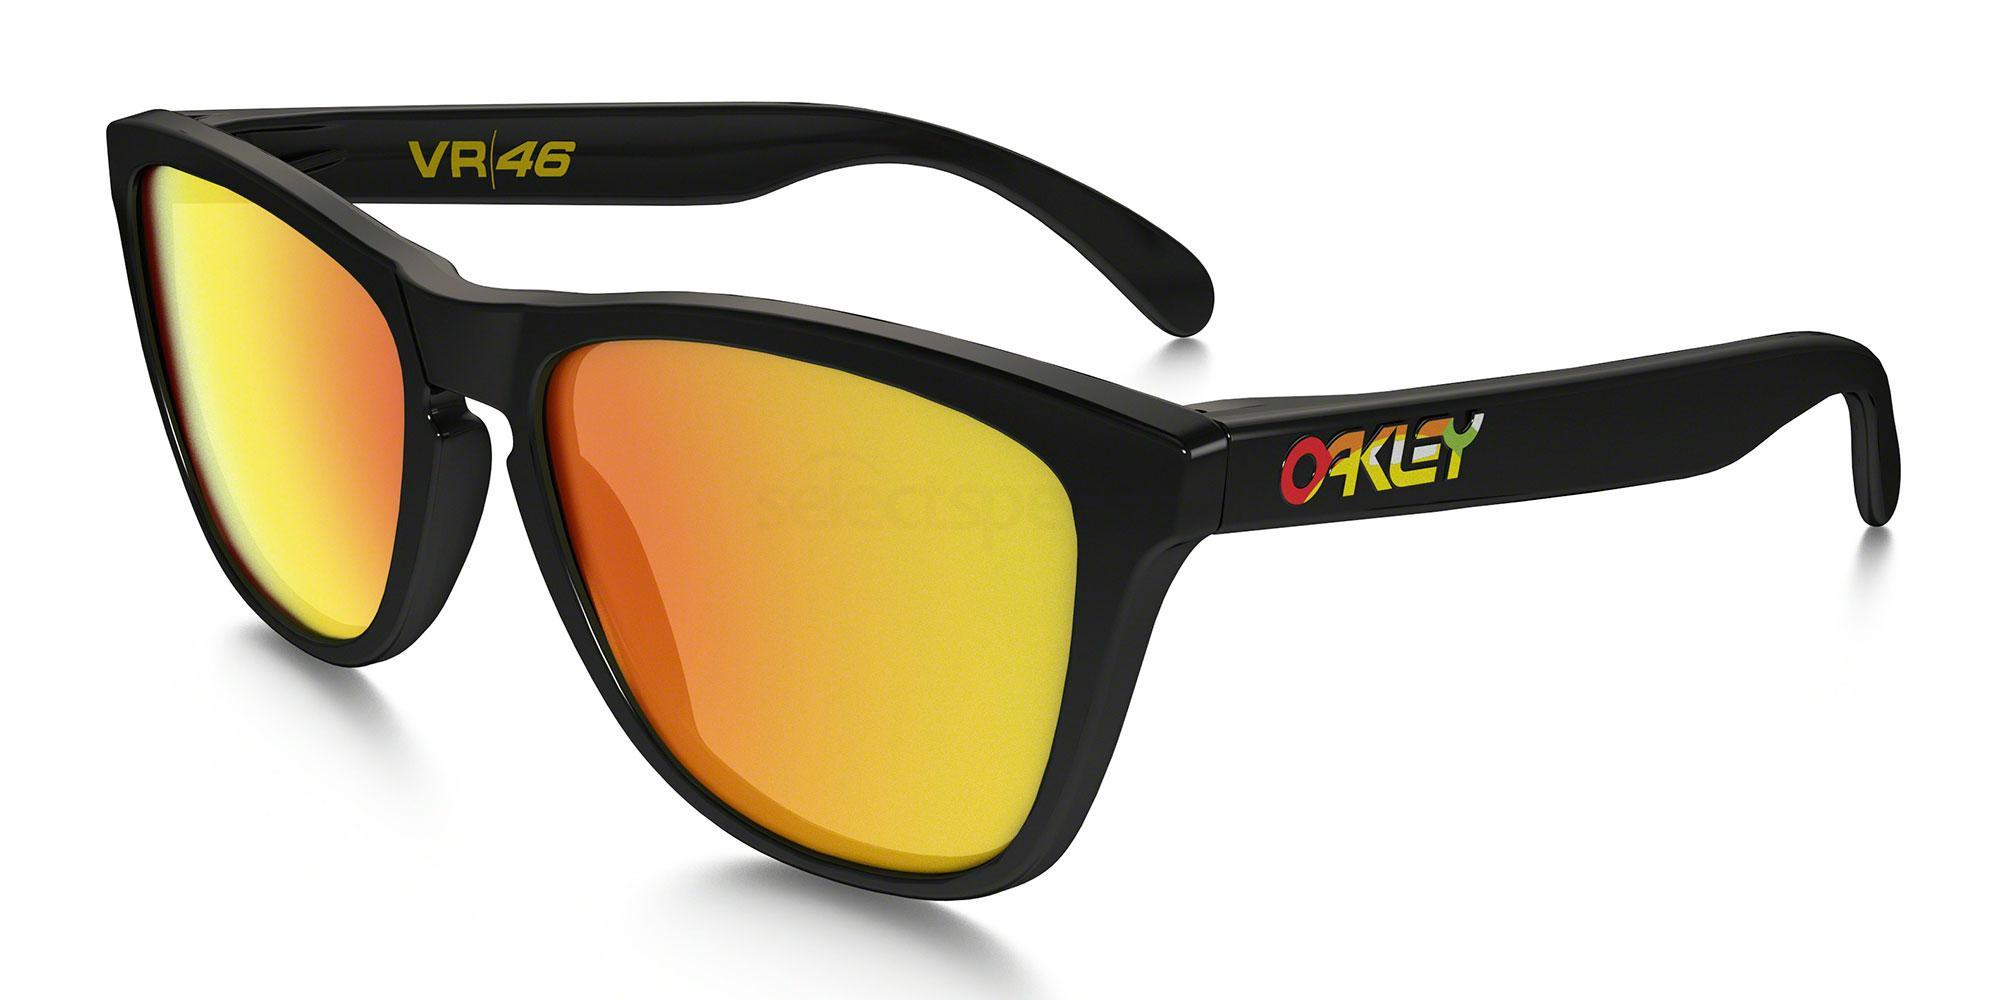 24-325 OO9013 VALENTINO ROSSI SIGNATURE SERIES FROGSKINS Sunglasses, Oakley